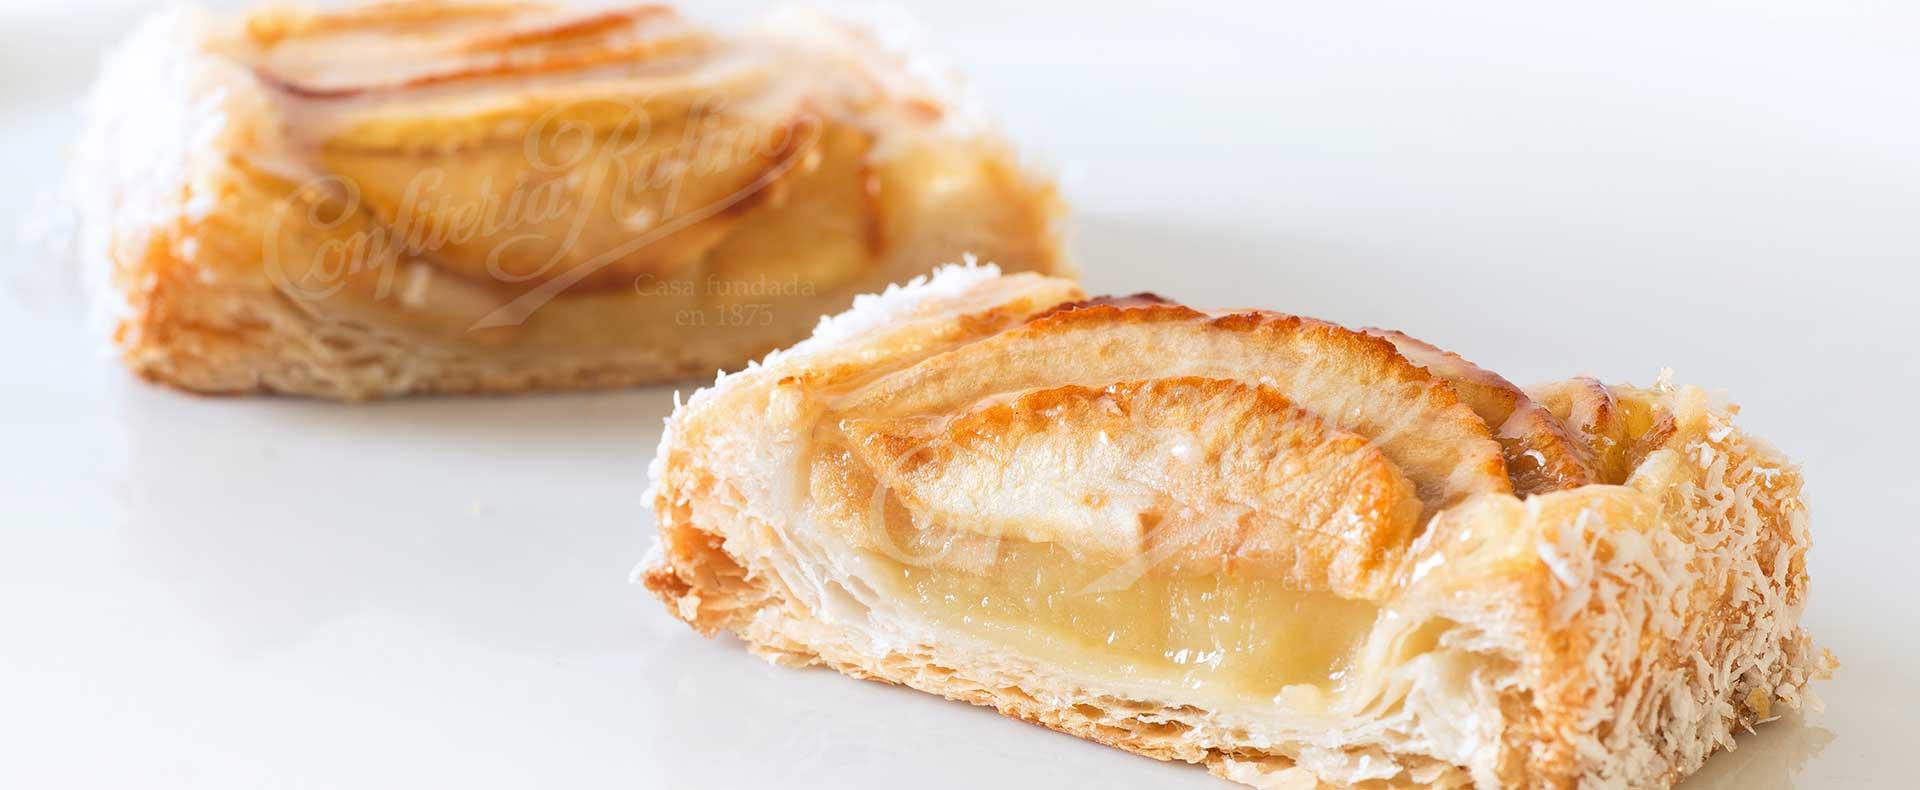 pastel artesano tarta de manzana Confiteria Rufino Aracena